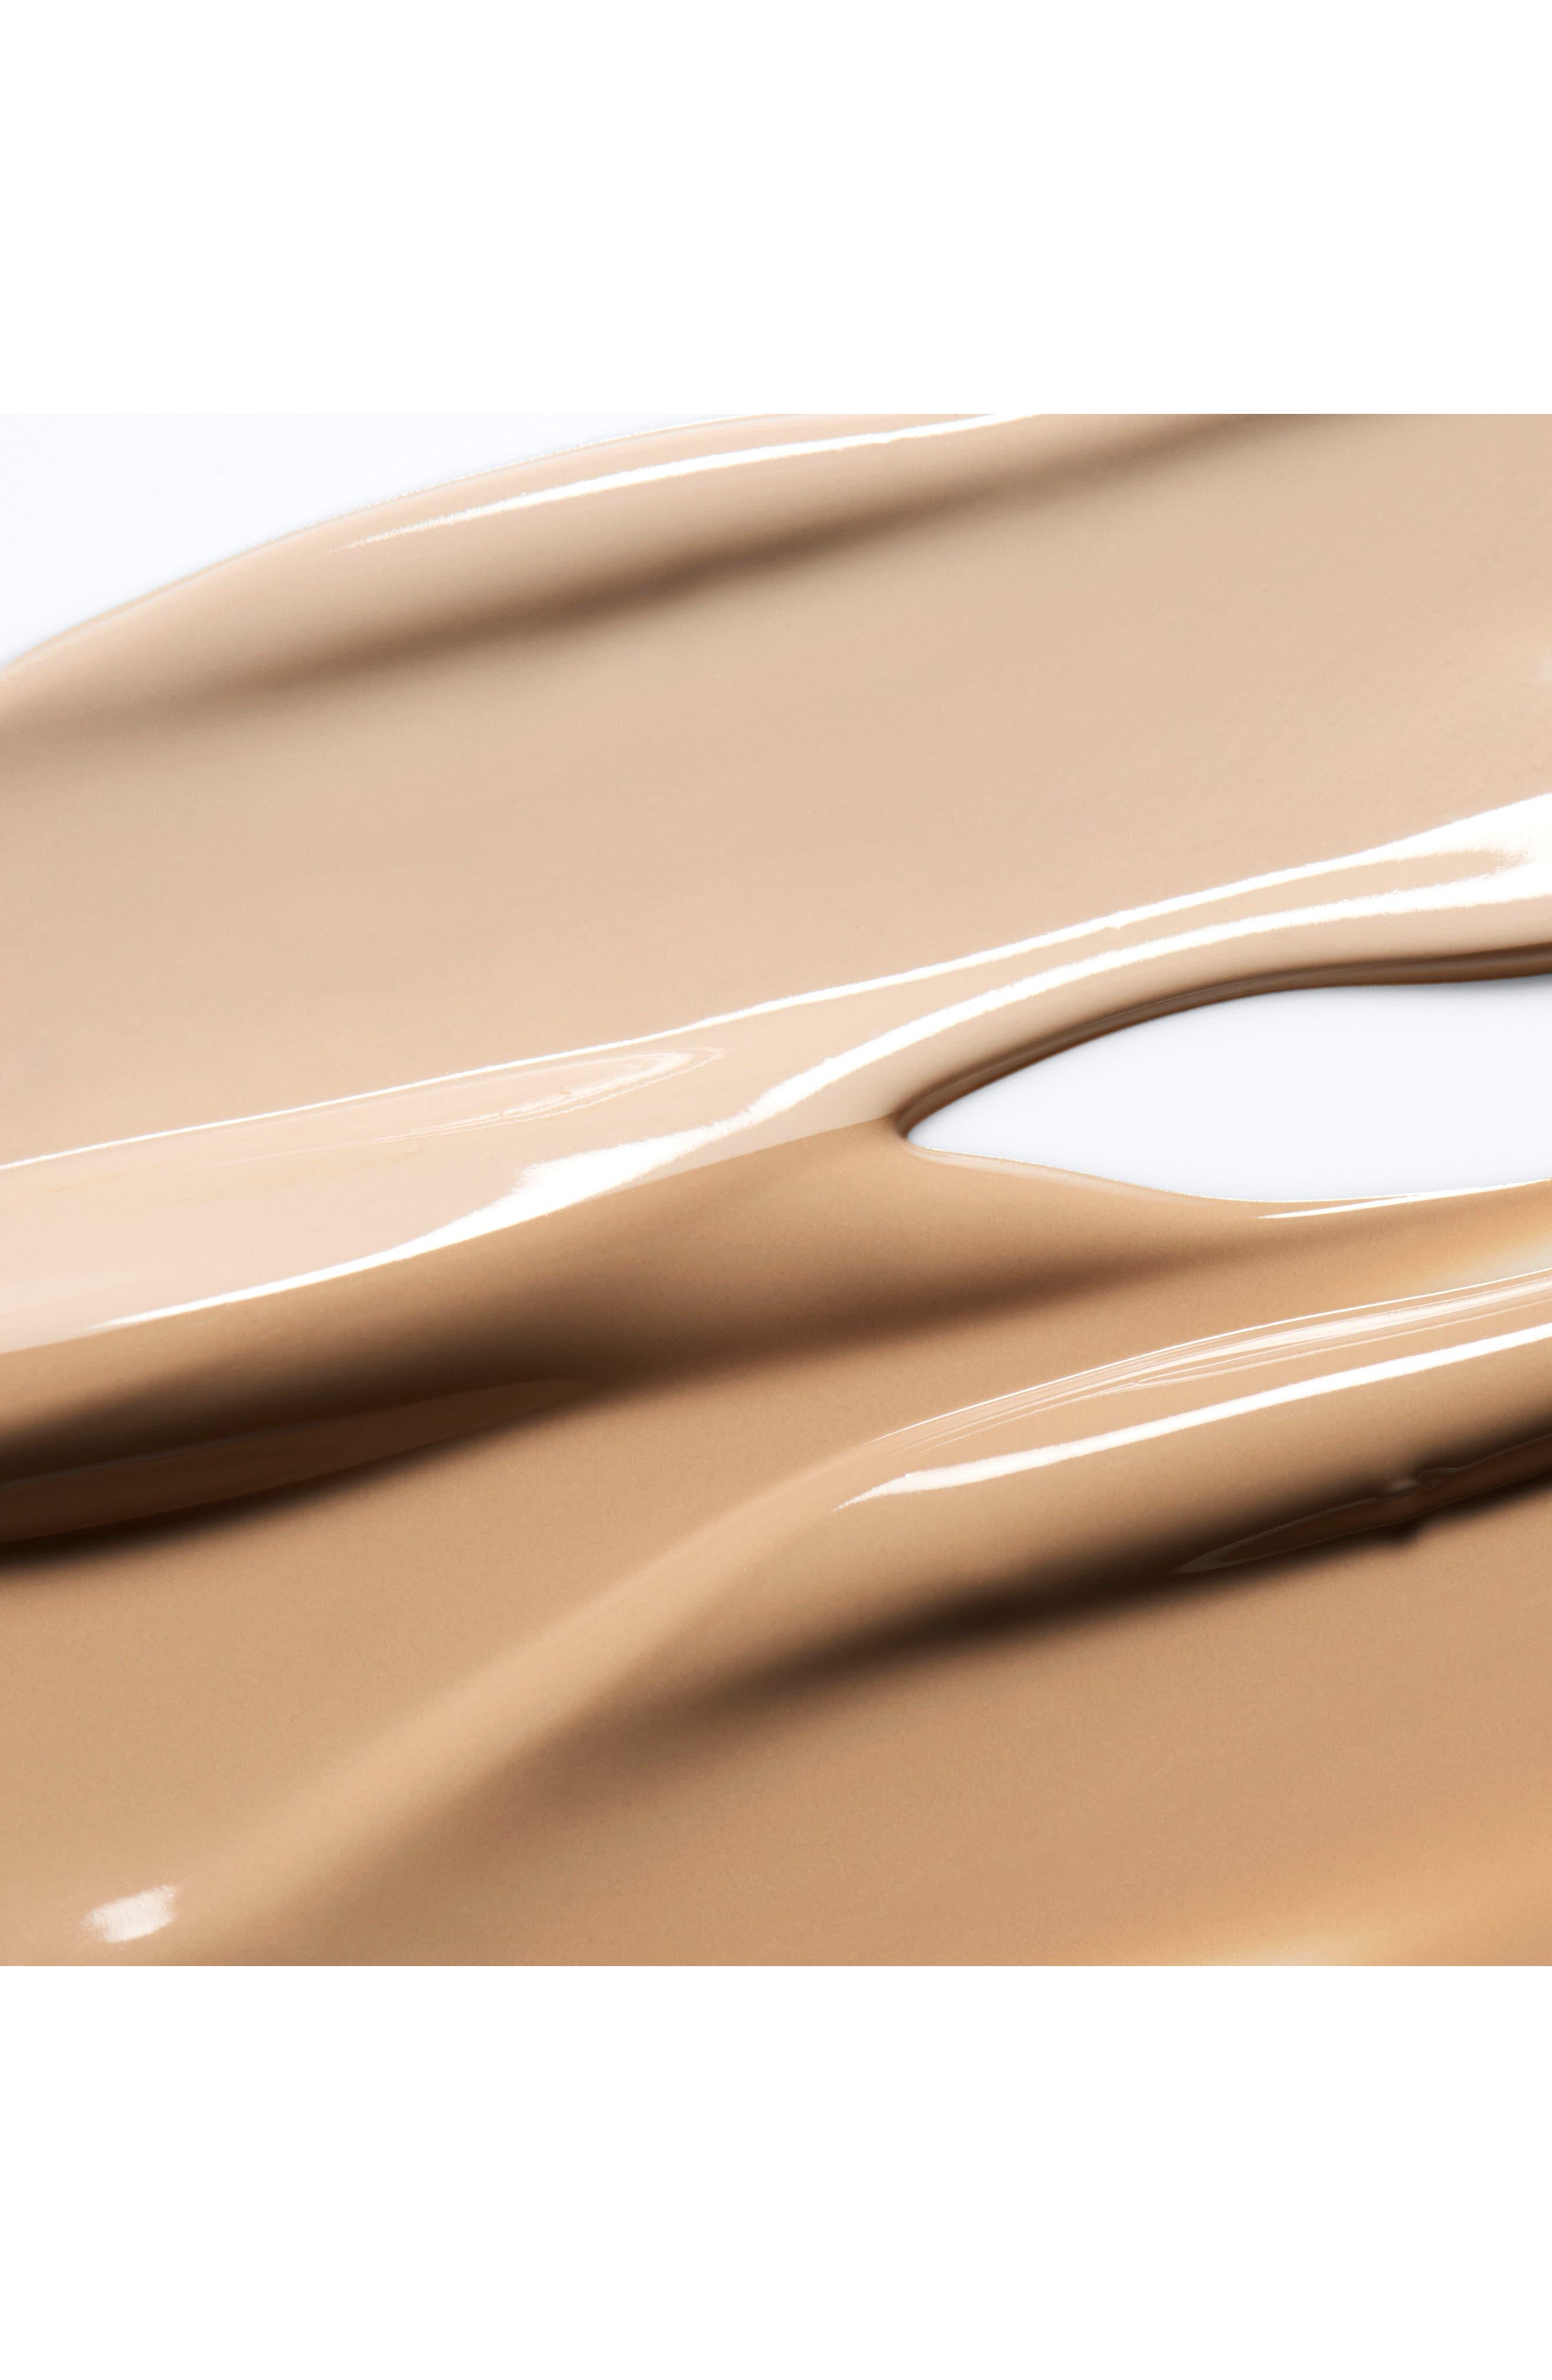 YVES SAINT LAURENT, Top Secrets BB Cream Skintone Perfector, Alternate thumbnail 2, color, LIGHT